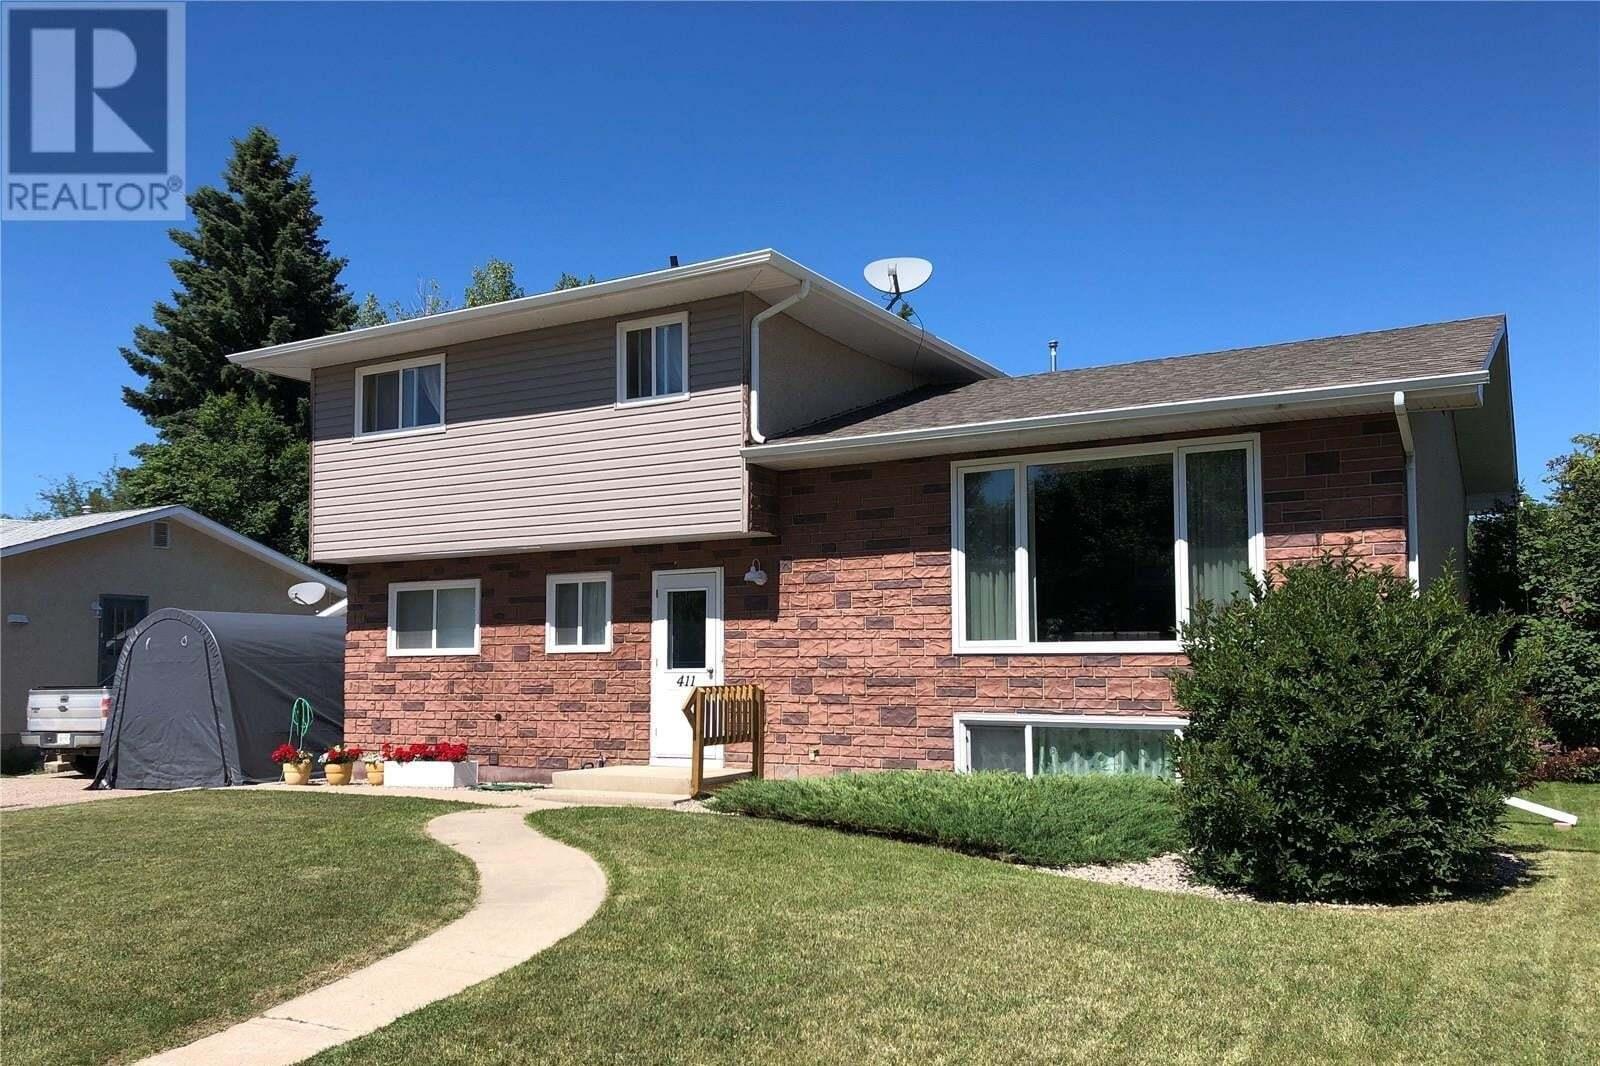 House for sale at 411 5th Ave W Biggar Saskatchewan - MLS: SK819247